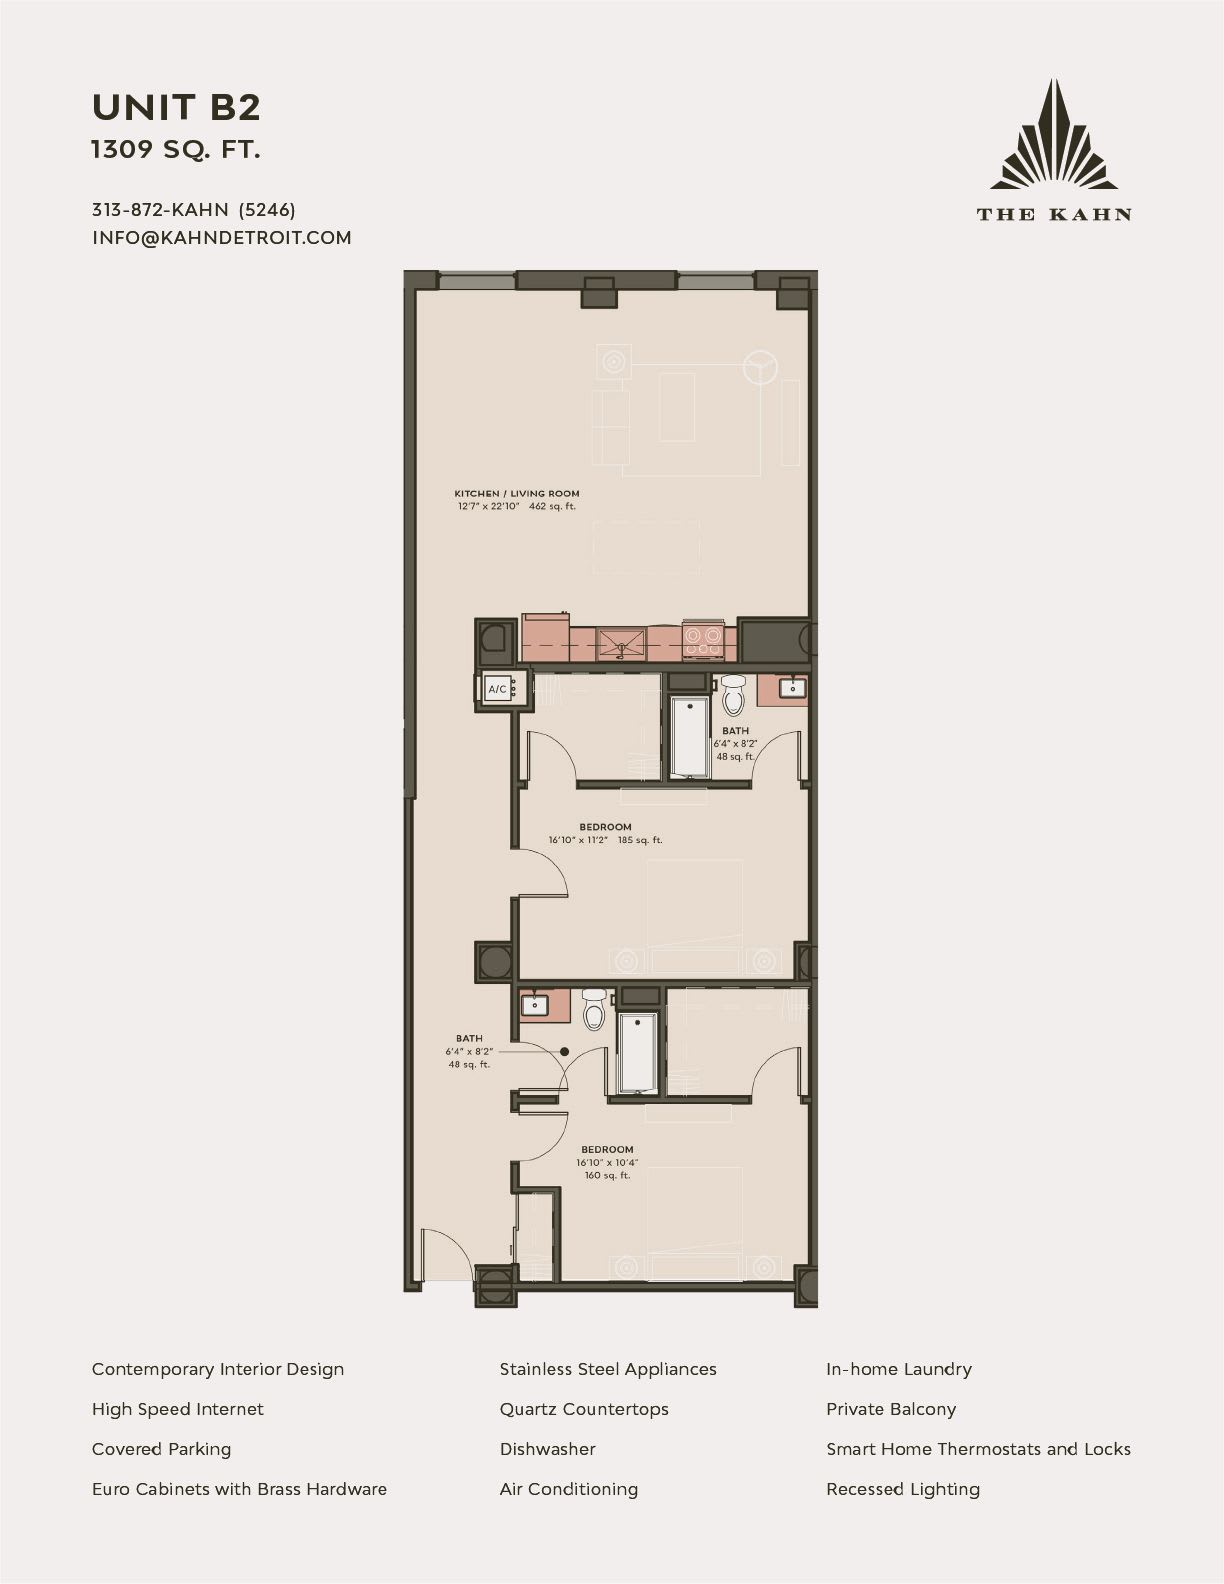 B2 floor plan image at The Kahn in Detroit, Michigan